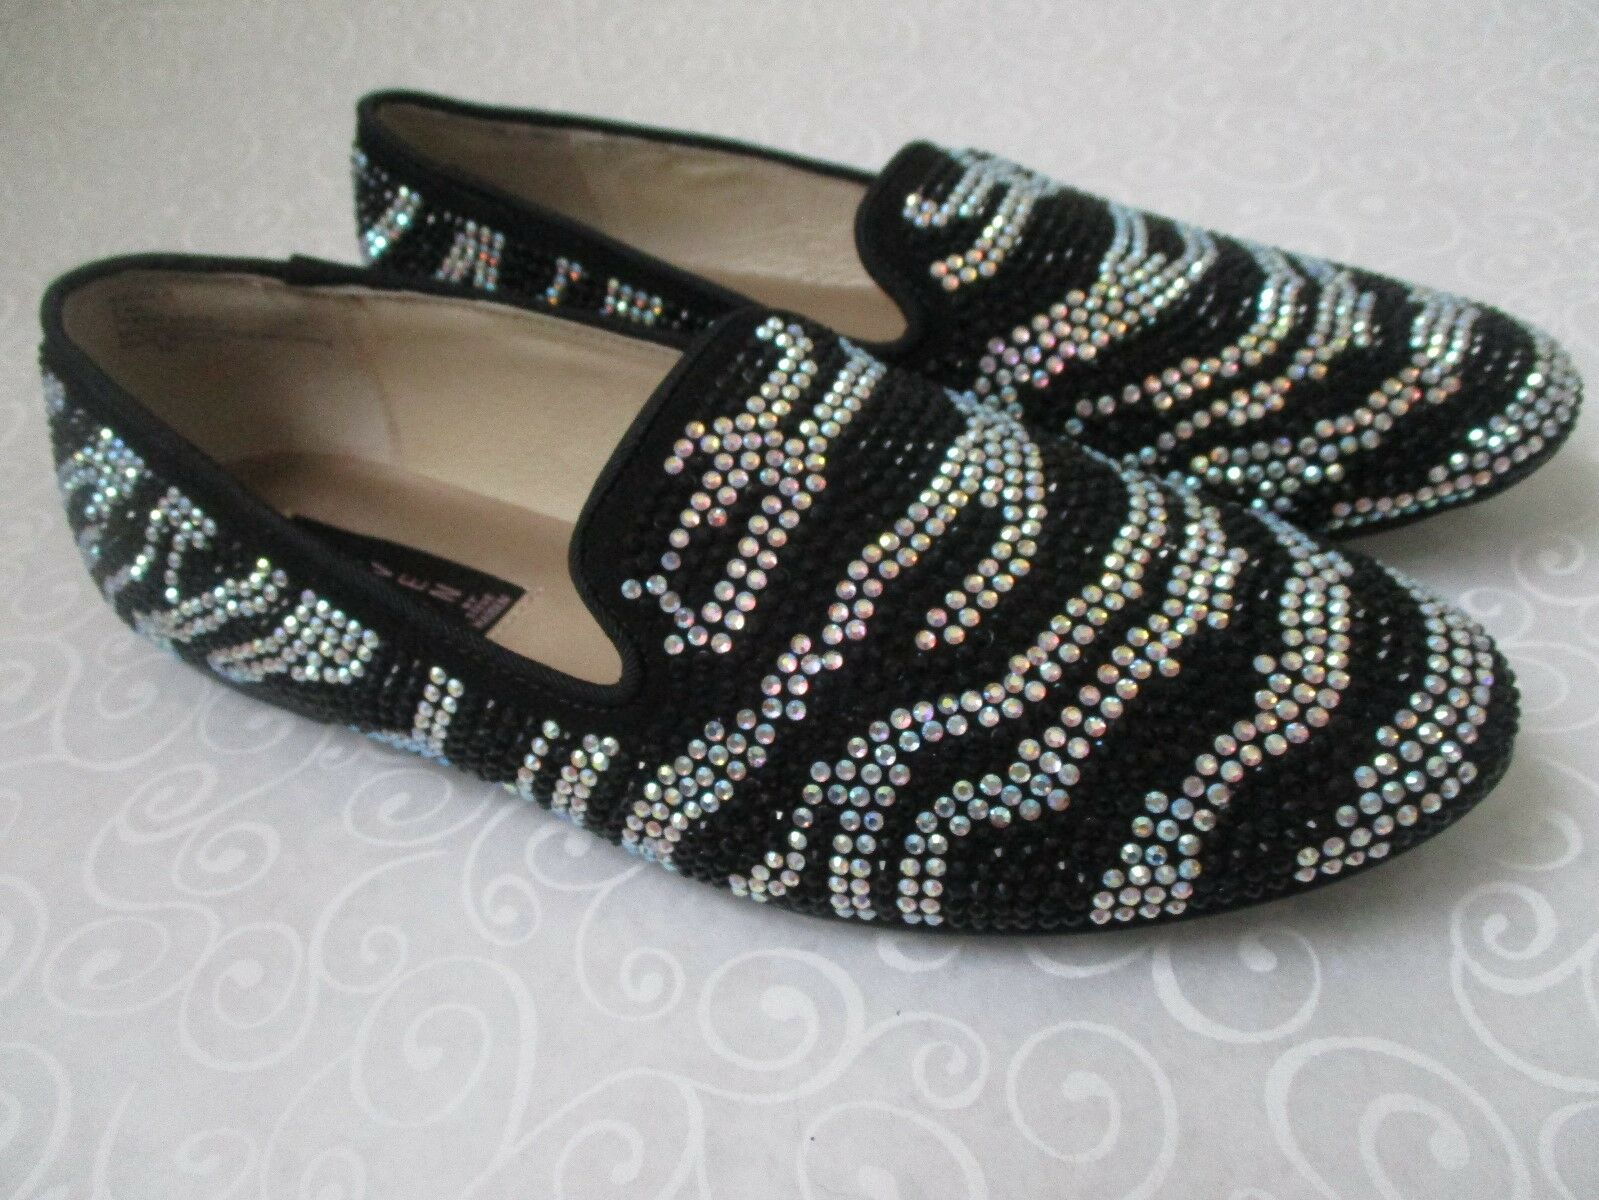 99 STEVEN BY STEVE MADDEN ZEBRA RHINESTONE FLATS Schuhe SIZE 11 M - NEU